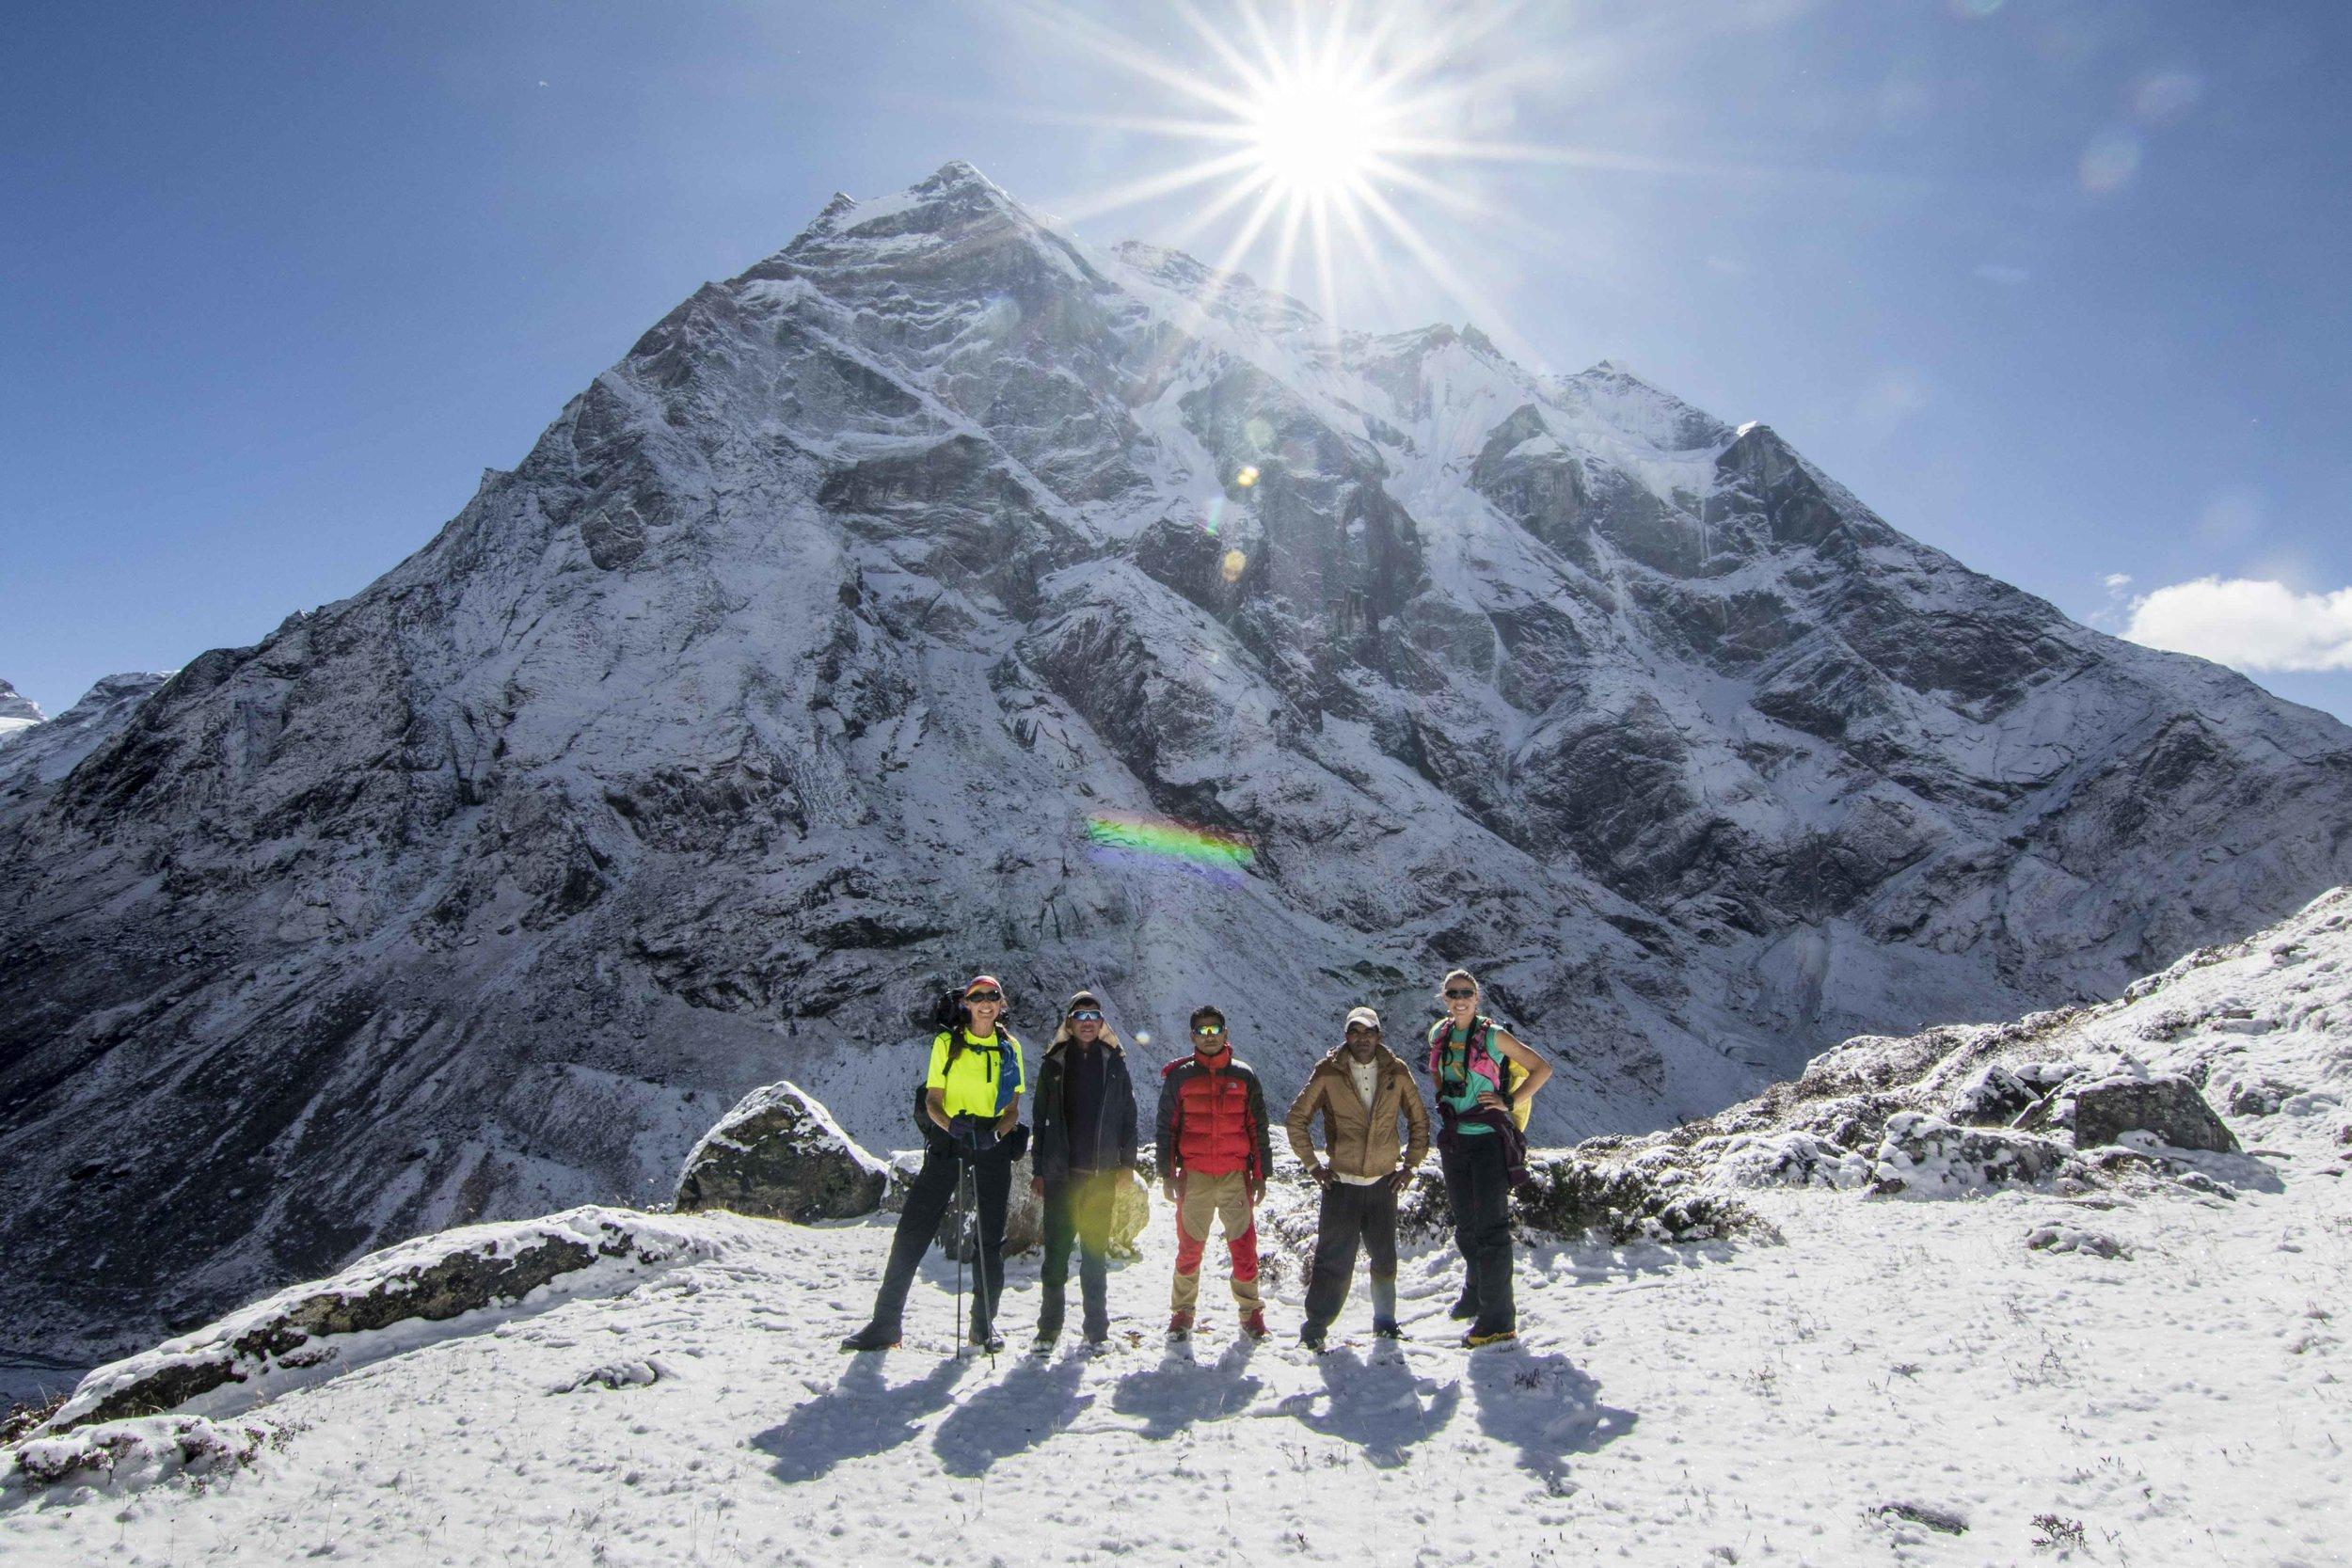 The team in front of Mera Peak (L-R Kat, Geljen, Antarwu, Gishnagiri, Tara; missing Sunny and Mingma)